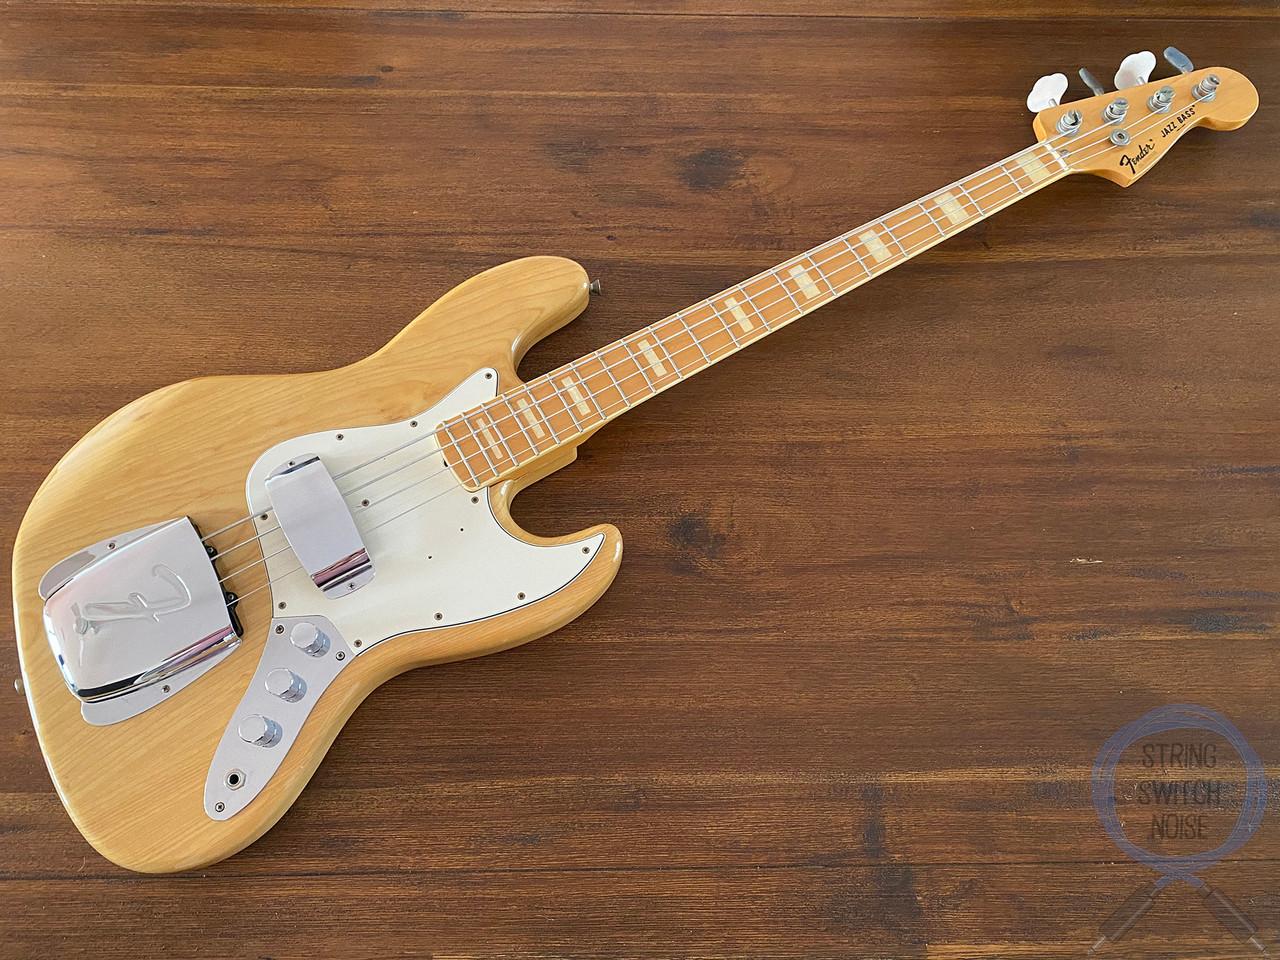 Fender Jazz Bass, '75, Natural Ashwood, 1997, USA Pickups, Hard Case